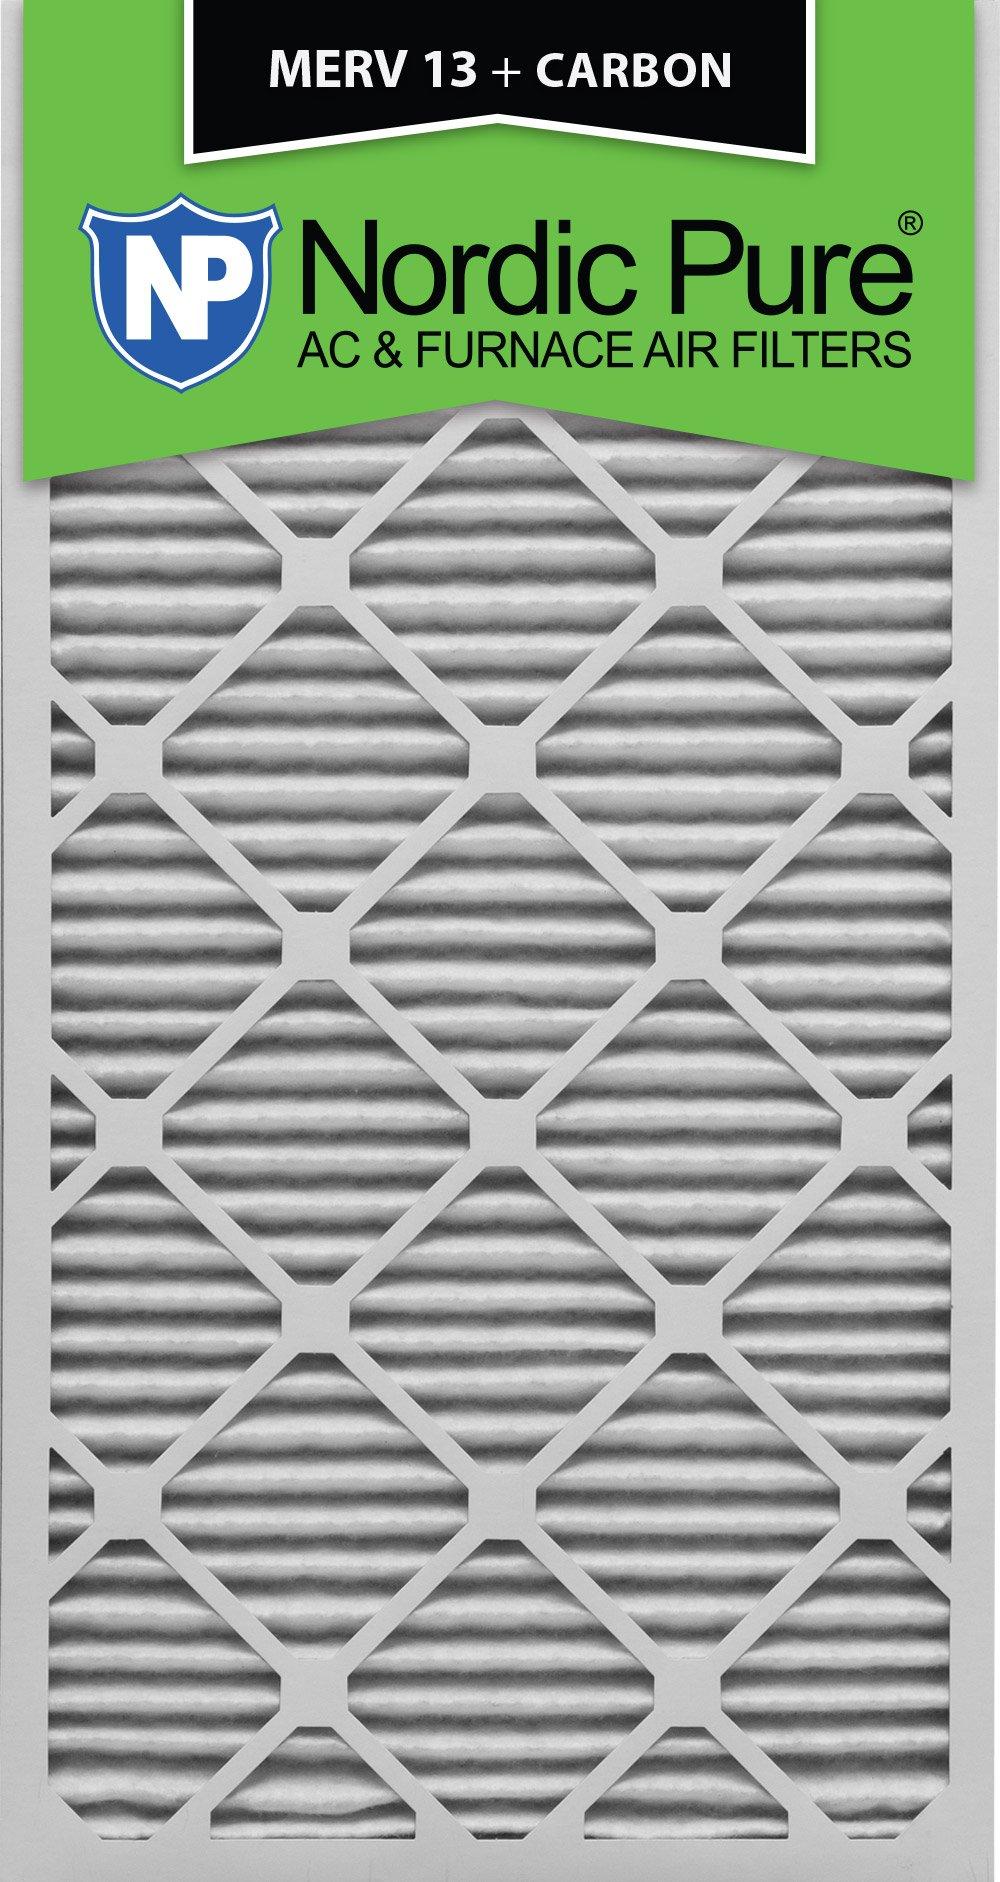 Nordic Pure 20x30x1M13+C-6 MERV 13 Plus Carbon AC Furnace Air Filters, Qty-6